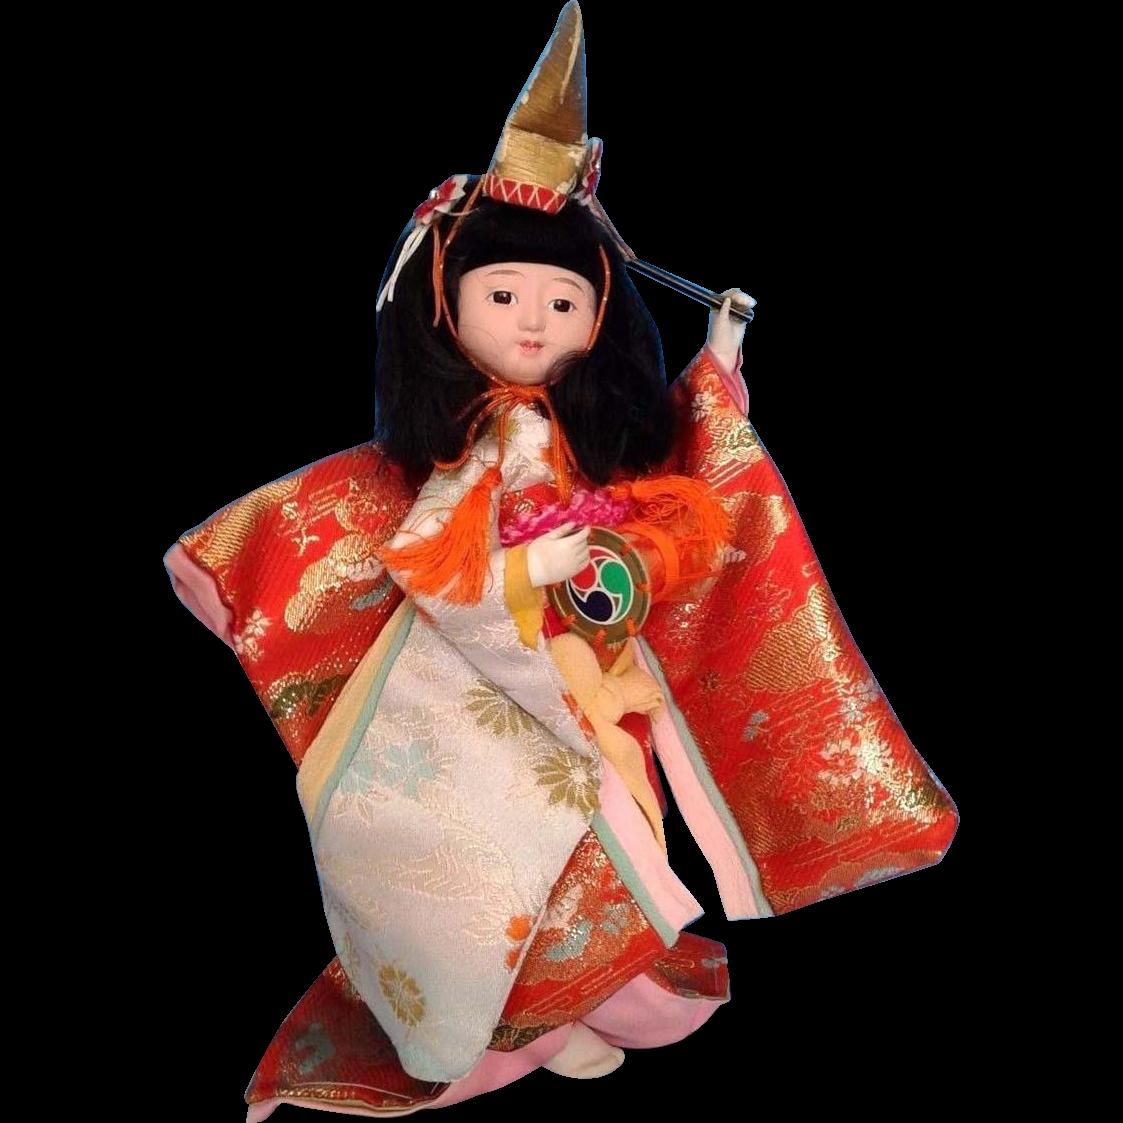 Japanese Vintage Ichimatsu Doll 一松人形 of Gofun